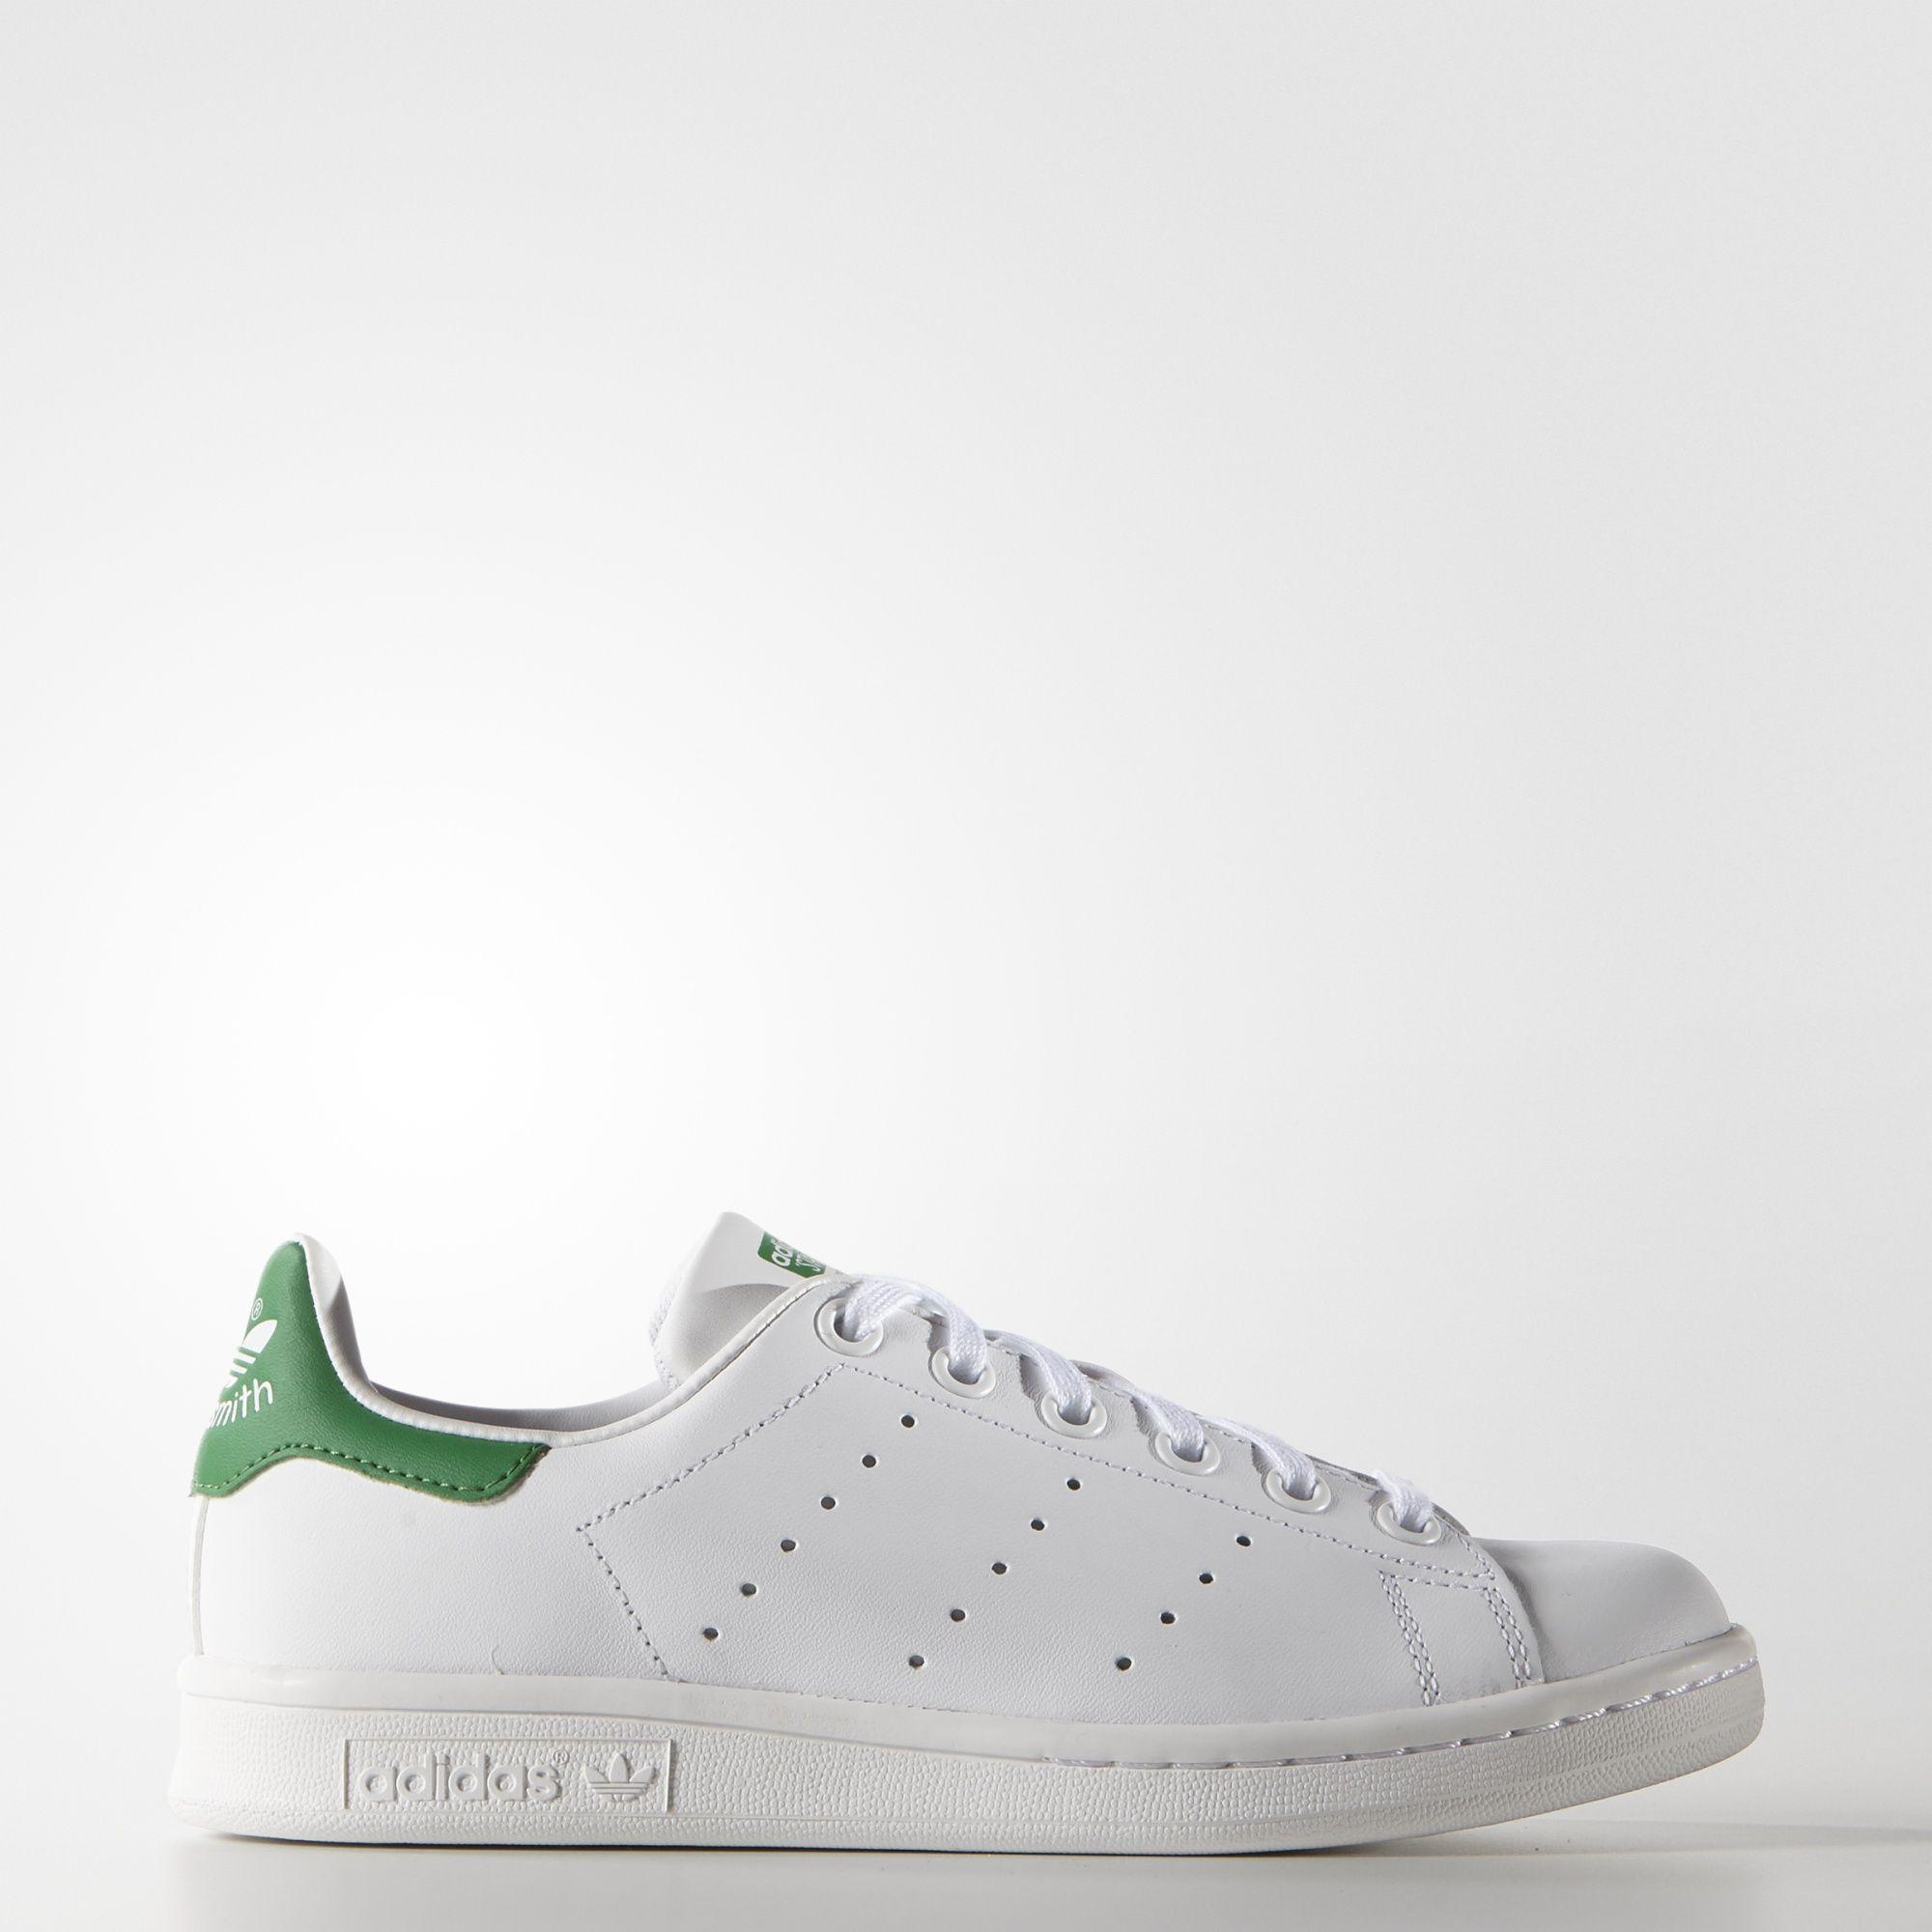 Stan Smith Shoes | Stan smith shoes, Adidas stan smith